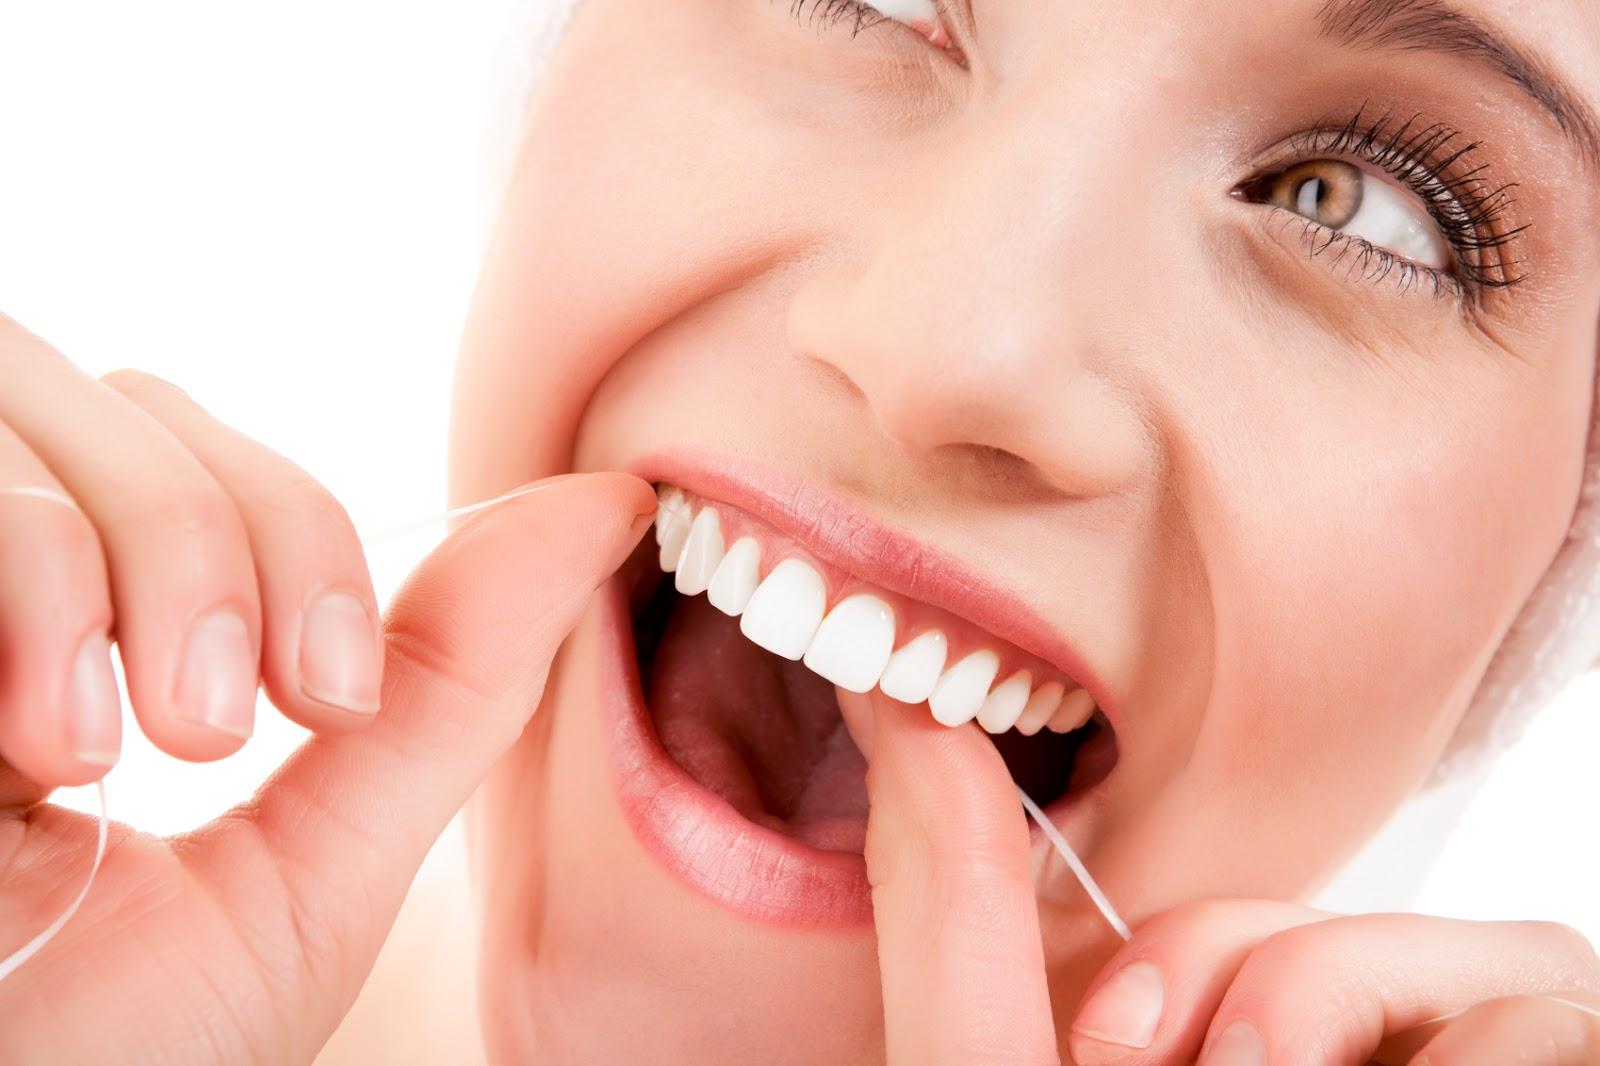 Taking+Care+of+Your+Teeth+Keep+Healthy.jpg